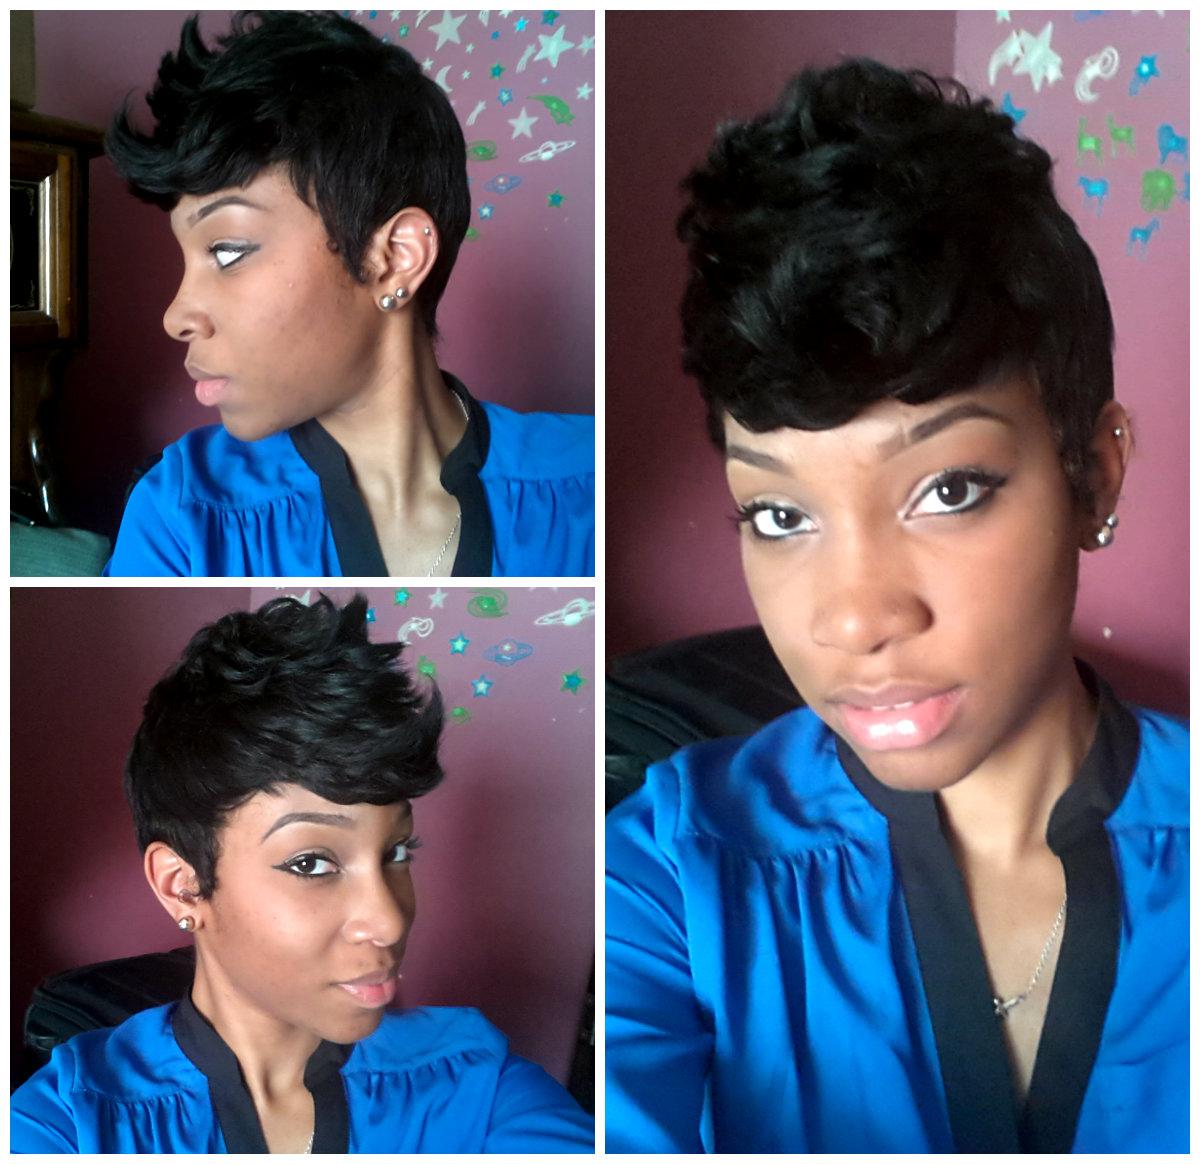 Tremendous 27 Piece Quick Weave Hairstyles Short Hairstyles Gunalazisus